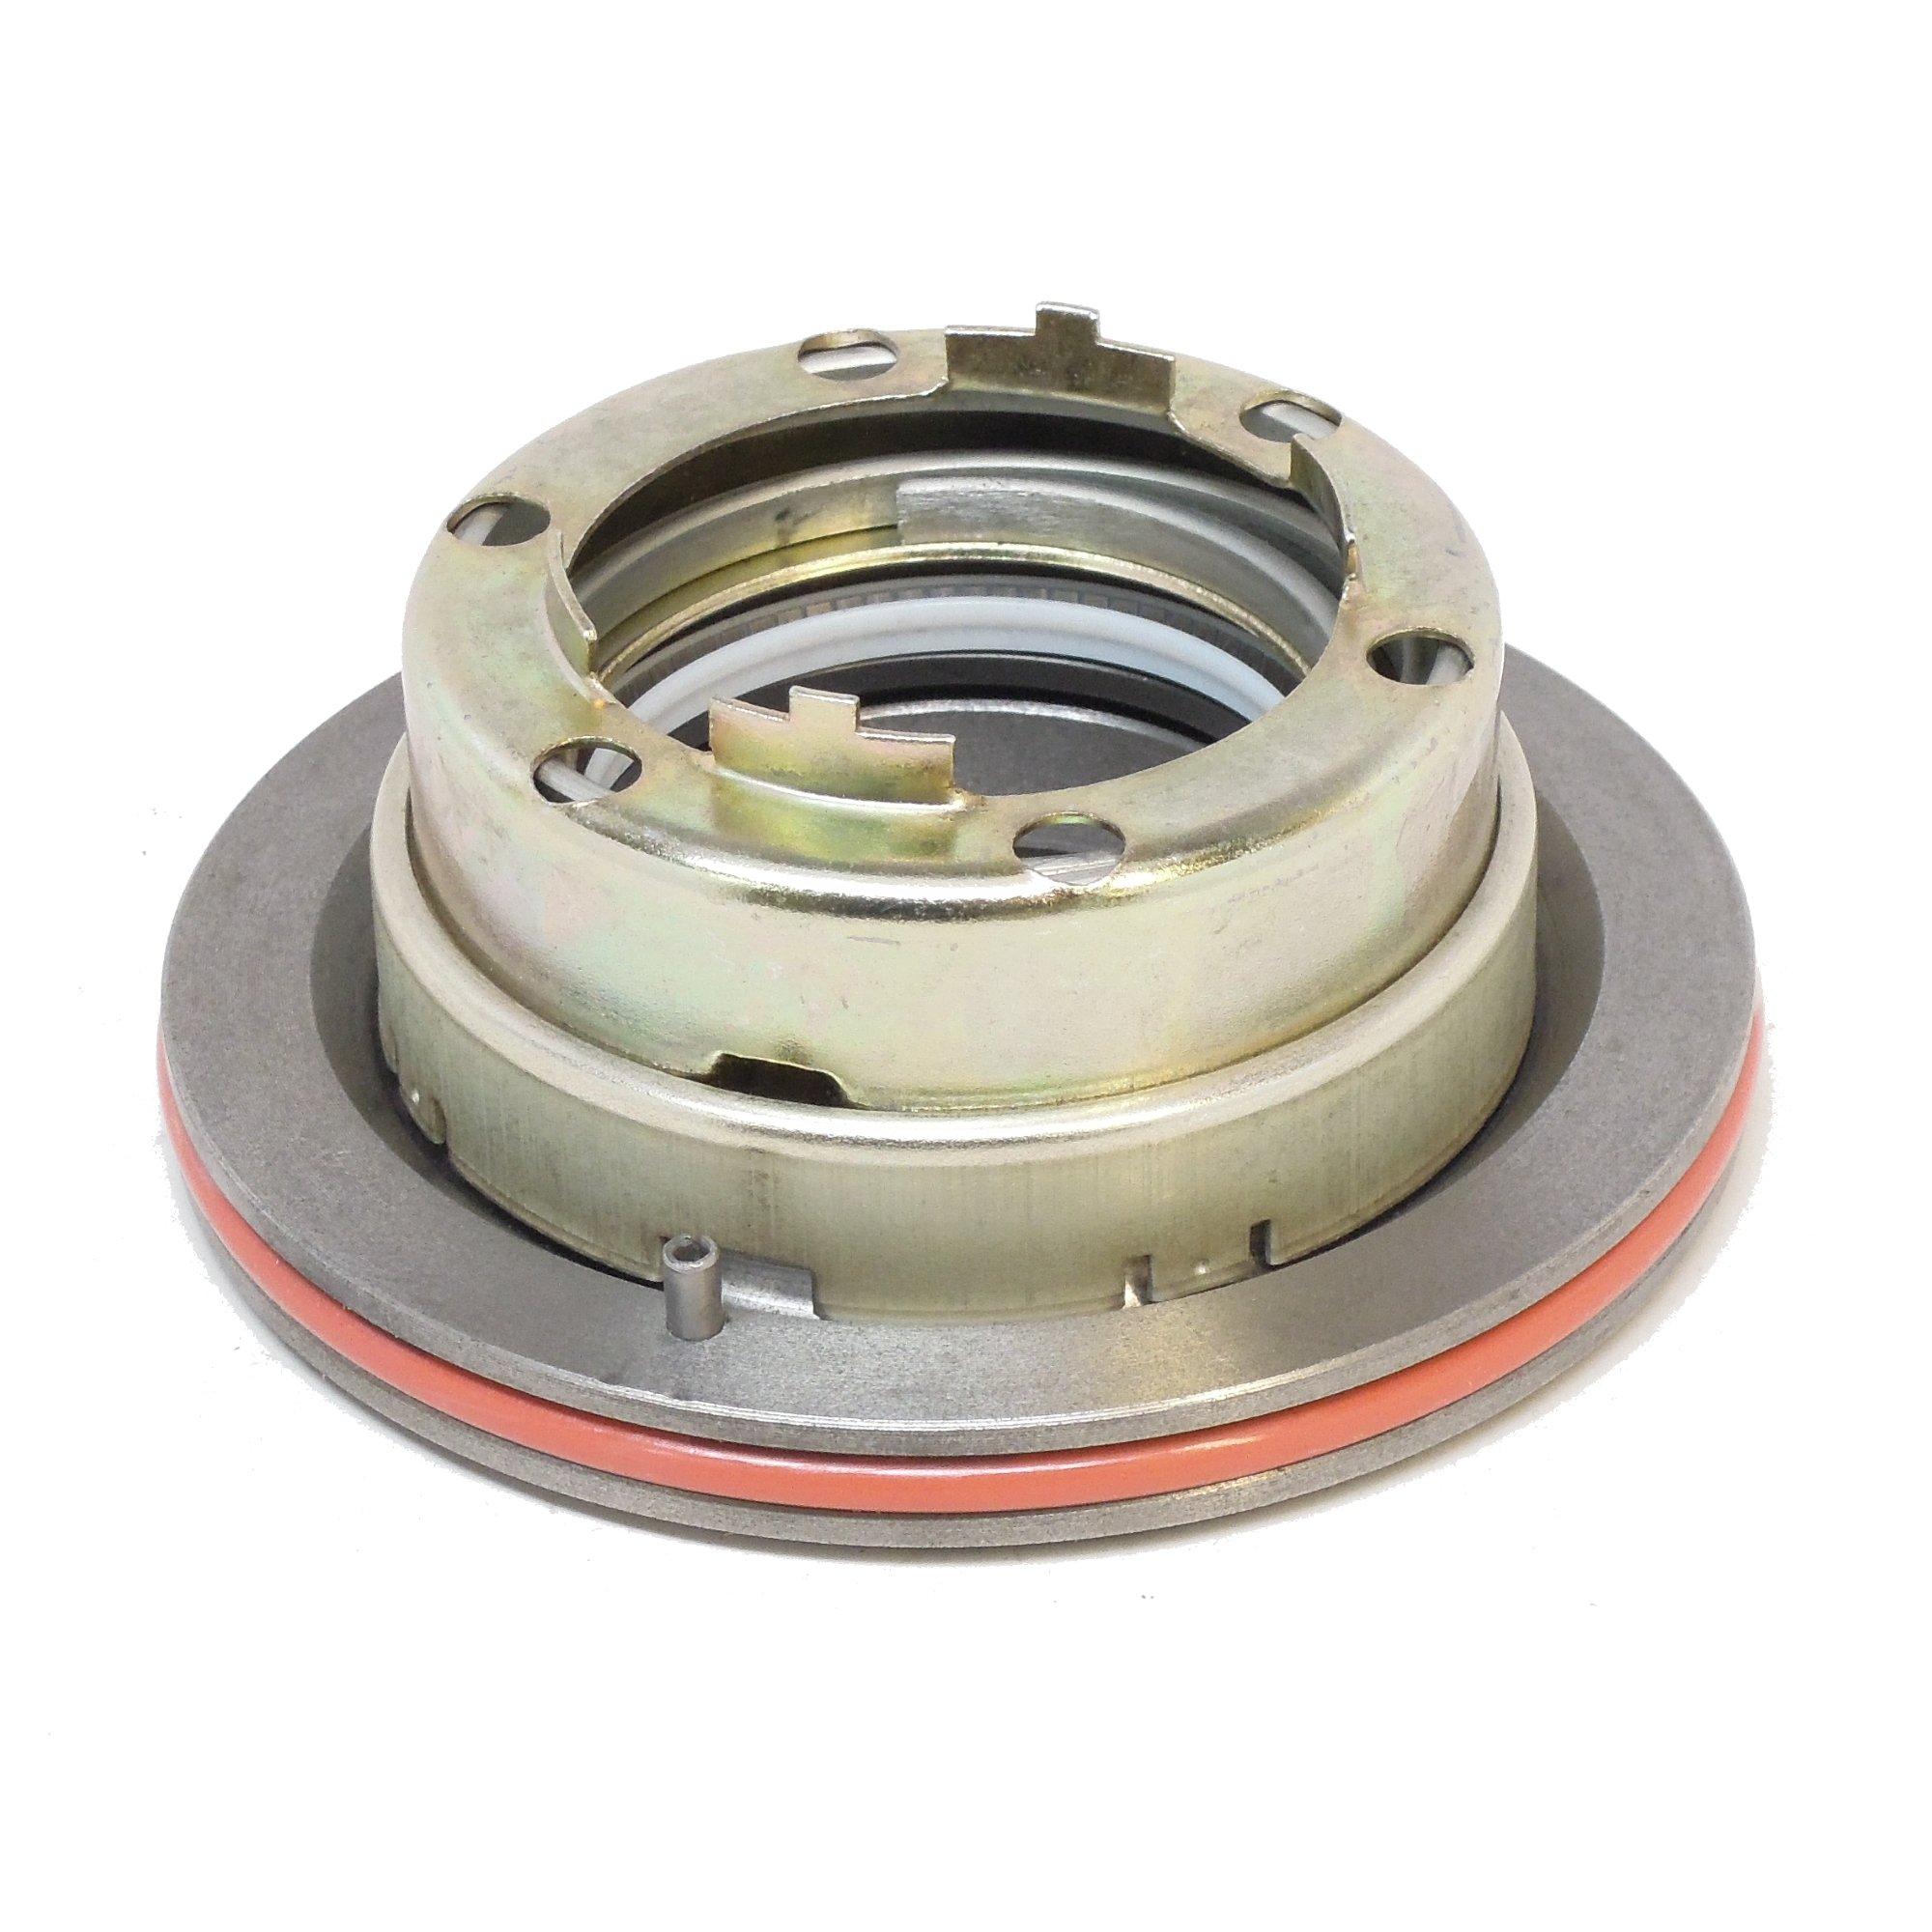 Blackmer 331873 Mechanical Seal (IACT) Cast Iron, Teflon/Carbon for a GX and X Series Pump